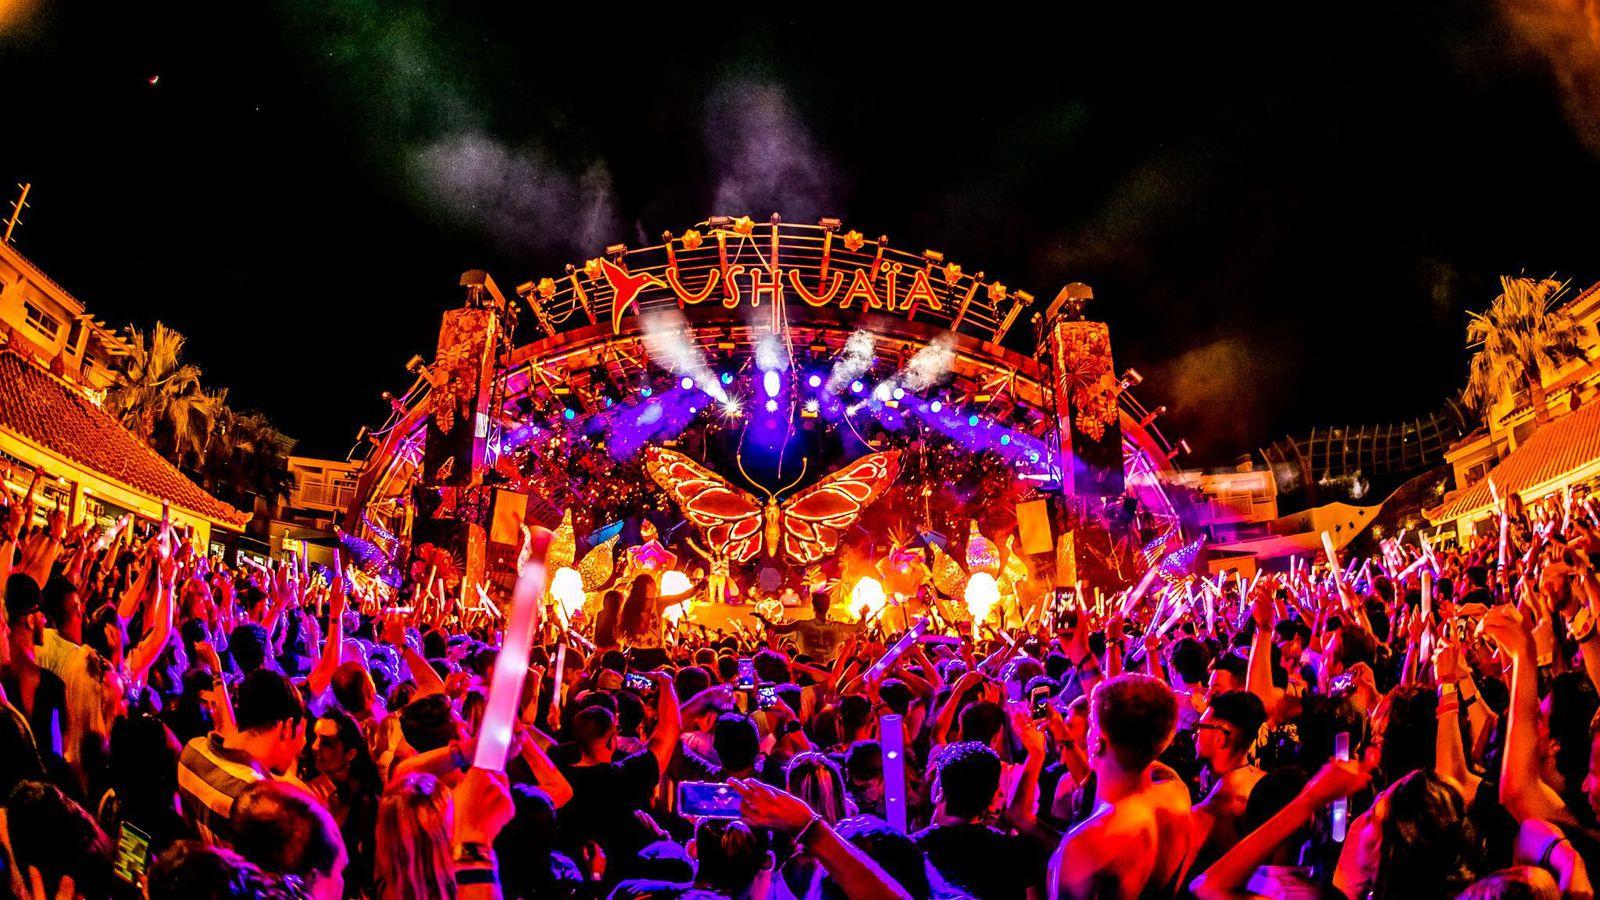 Ushuaïa Ibiza confirma su primera residencia de 2019